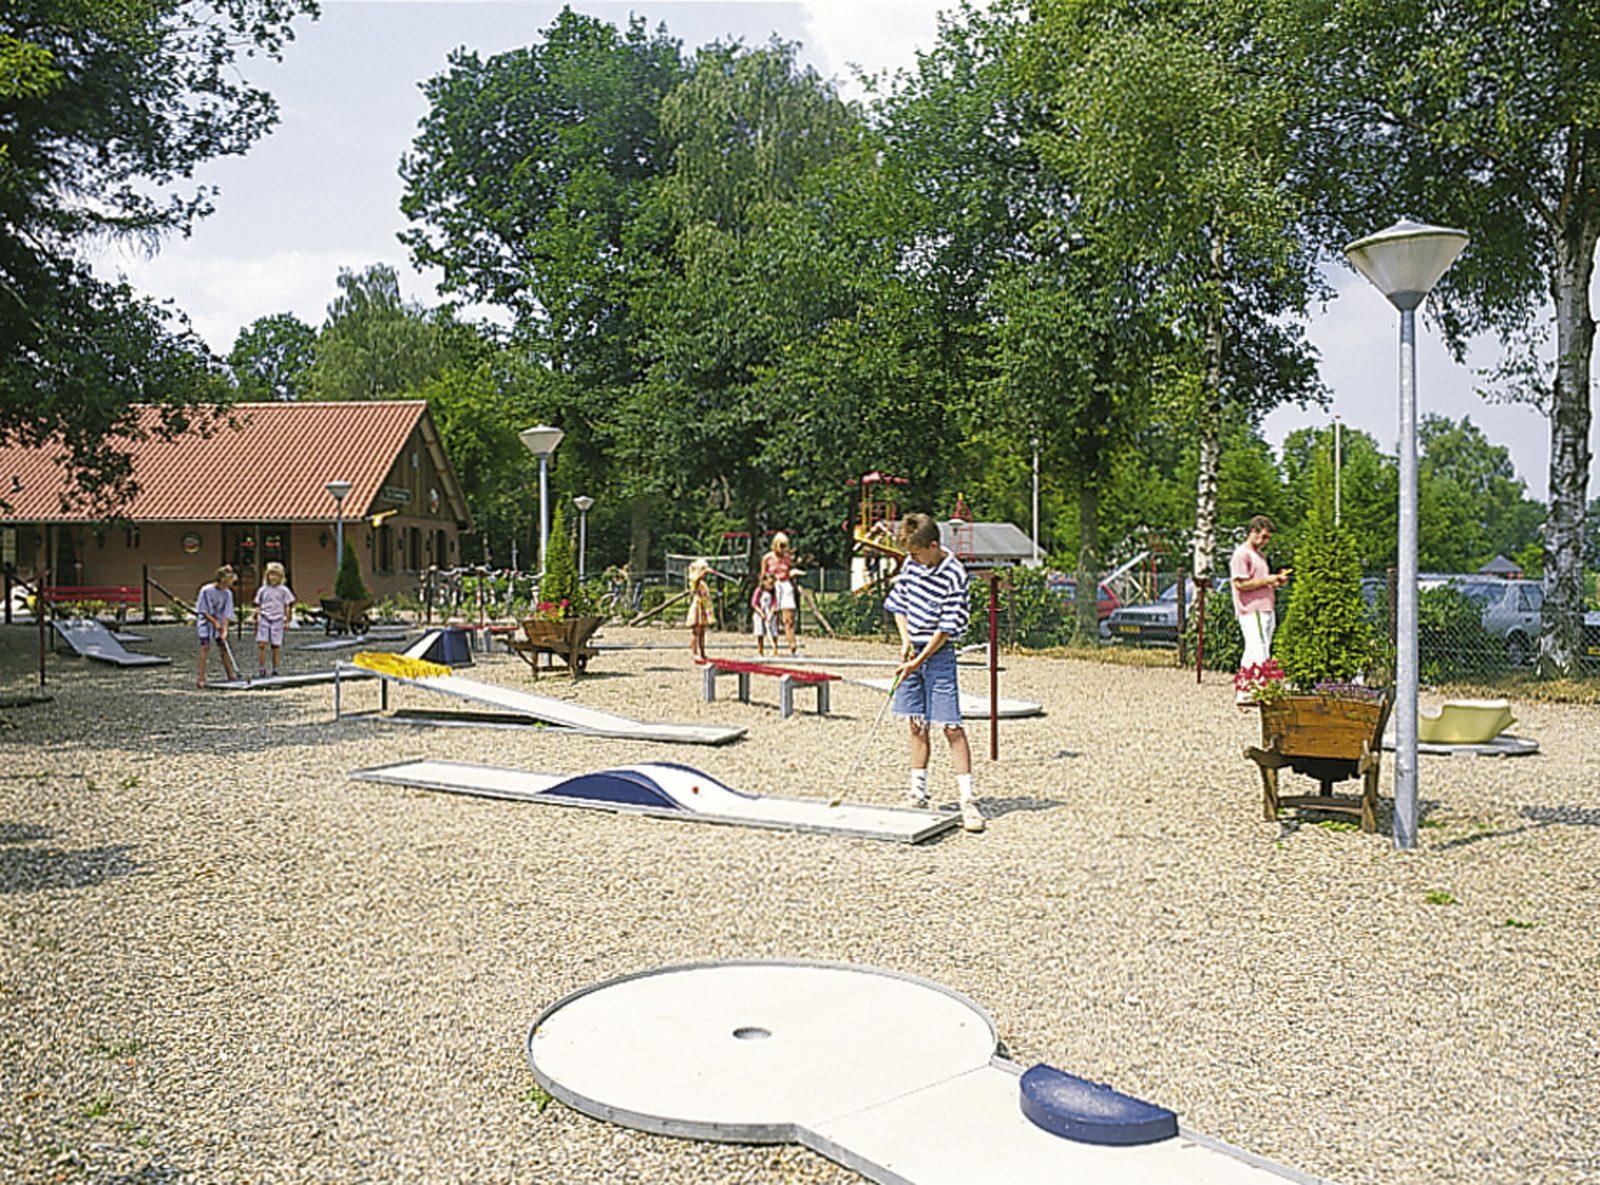 Minigolf course Holten